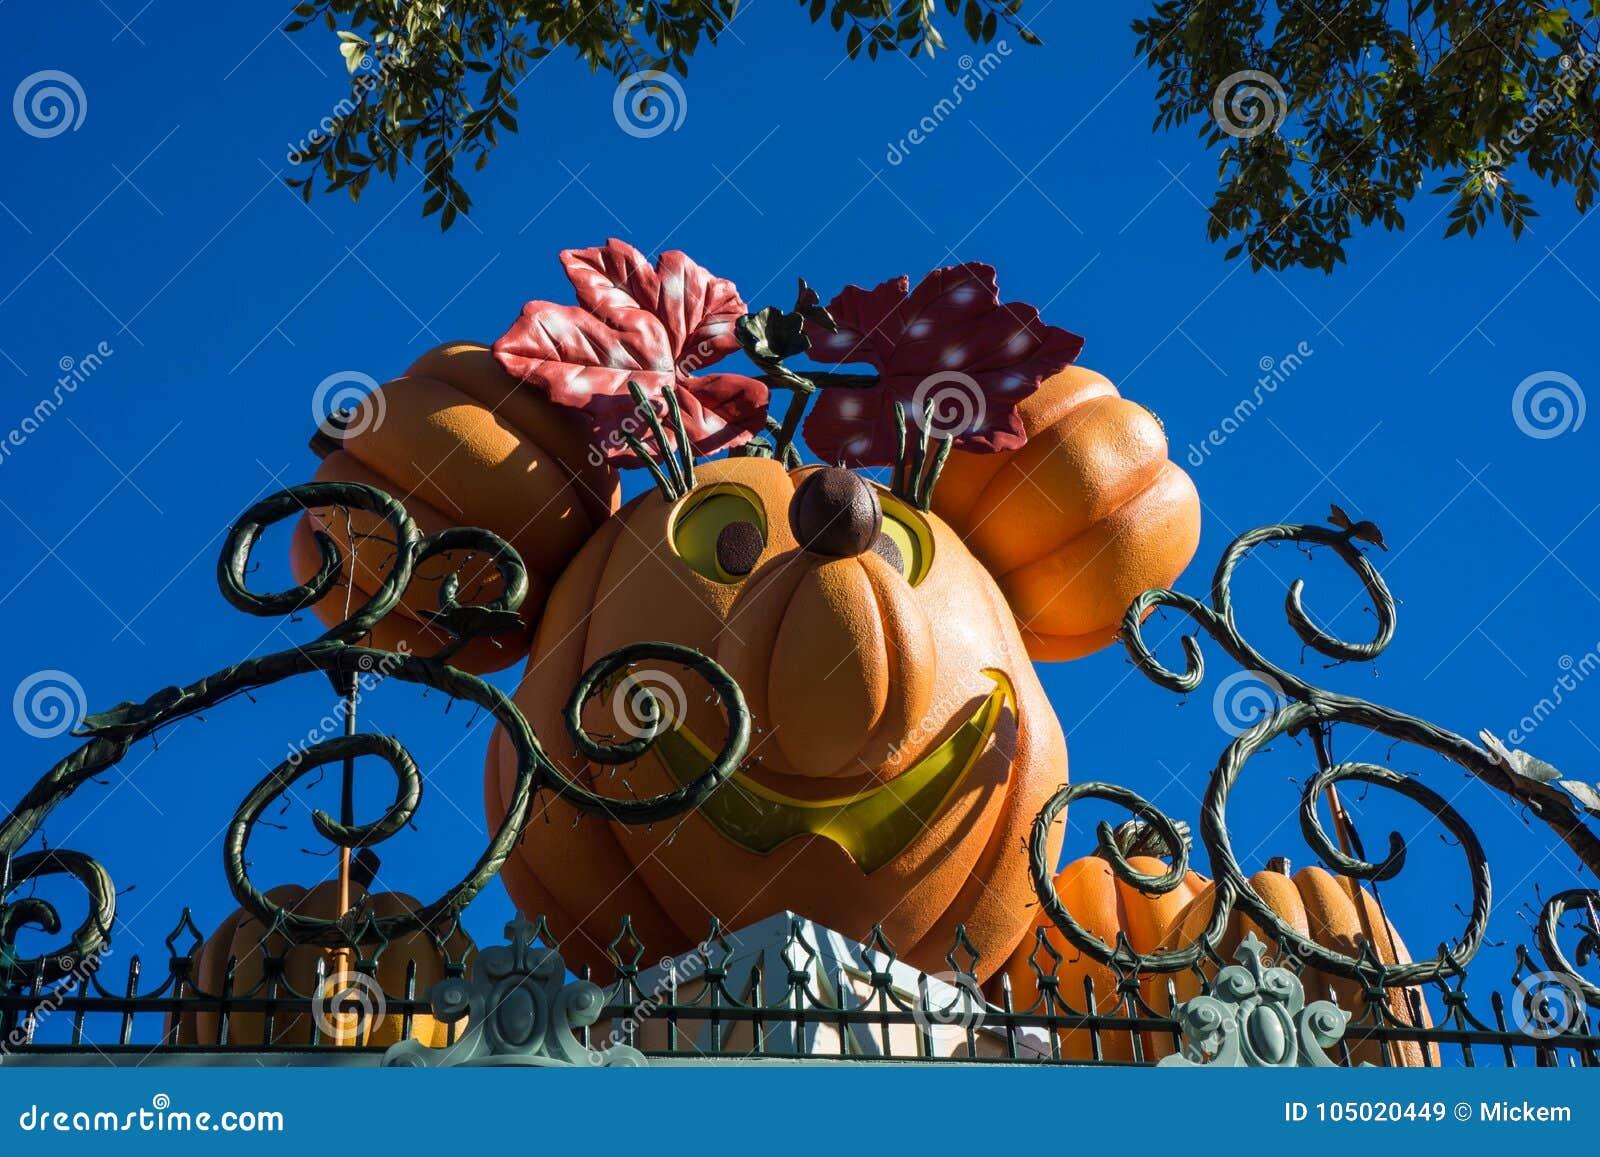 Disneyland Halloween Decor Minnie Mouse